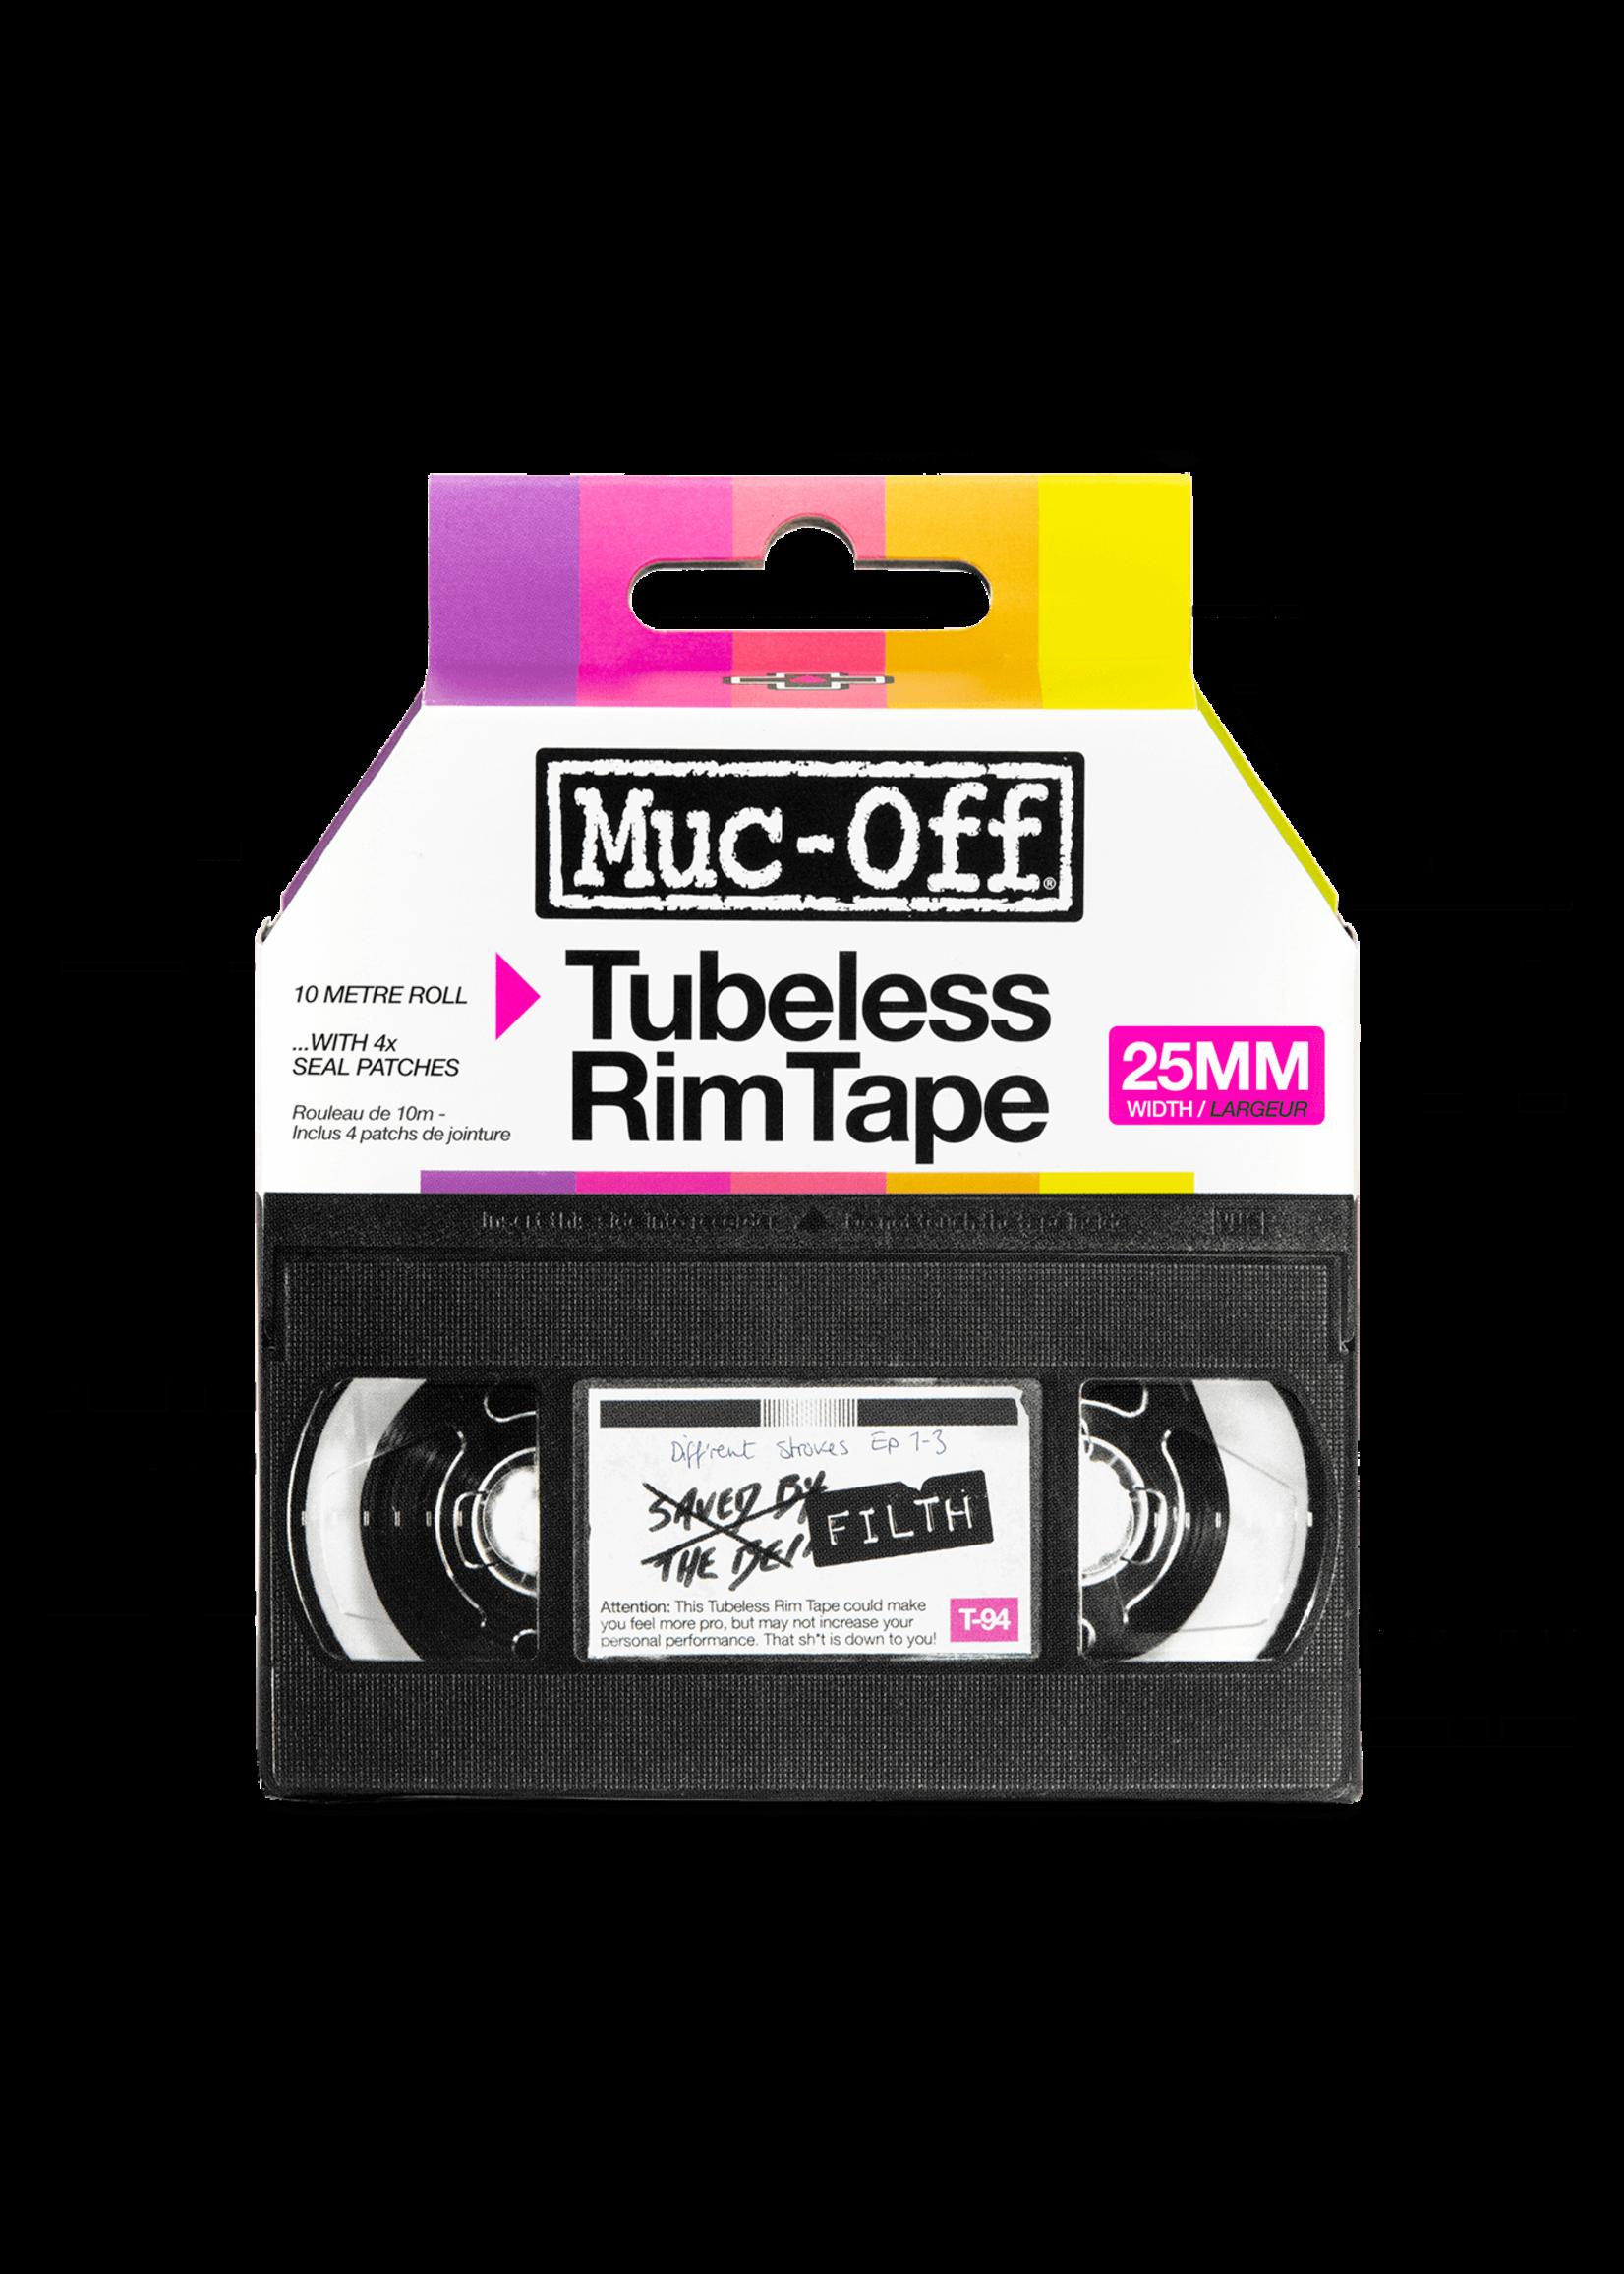 Muc-Off Tubeless Rim Tape 25mm